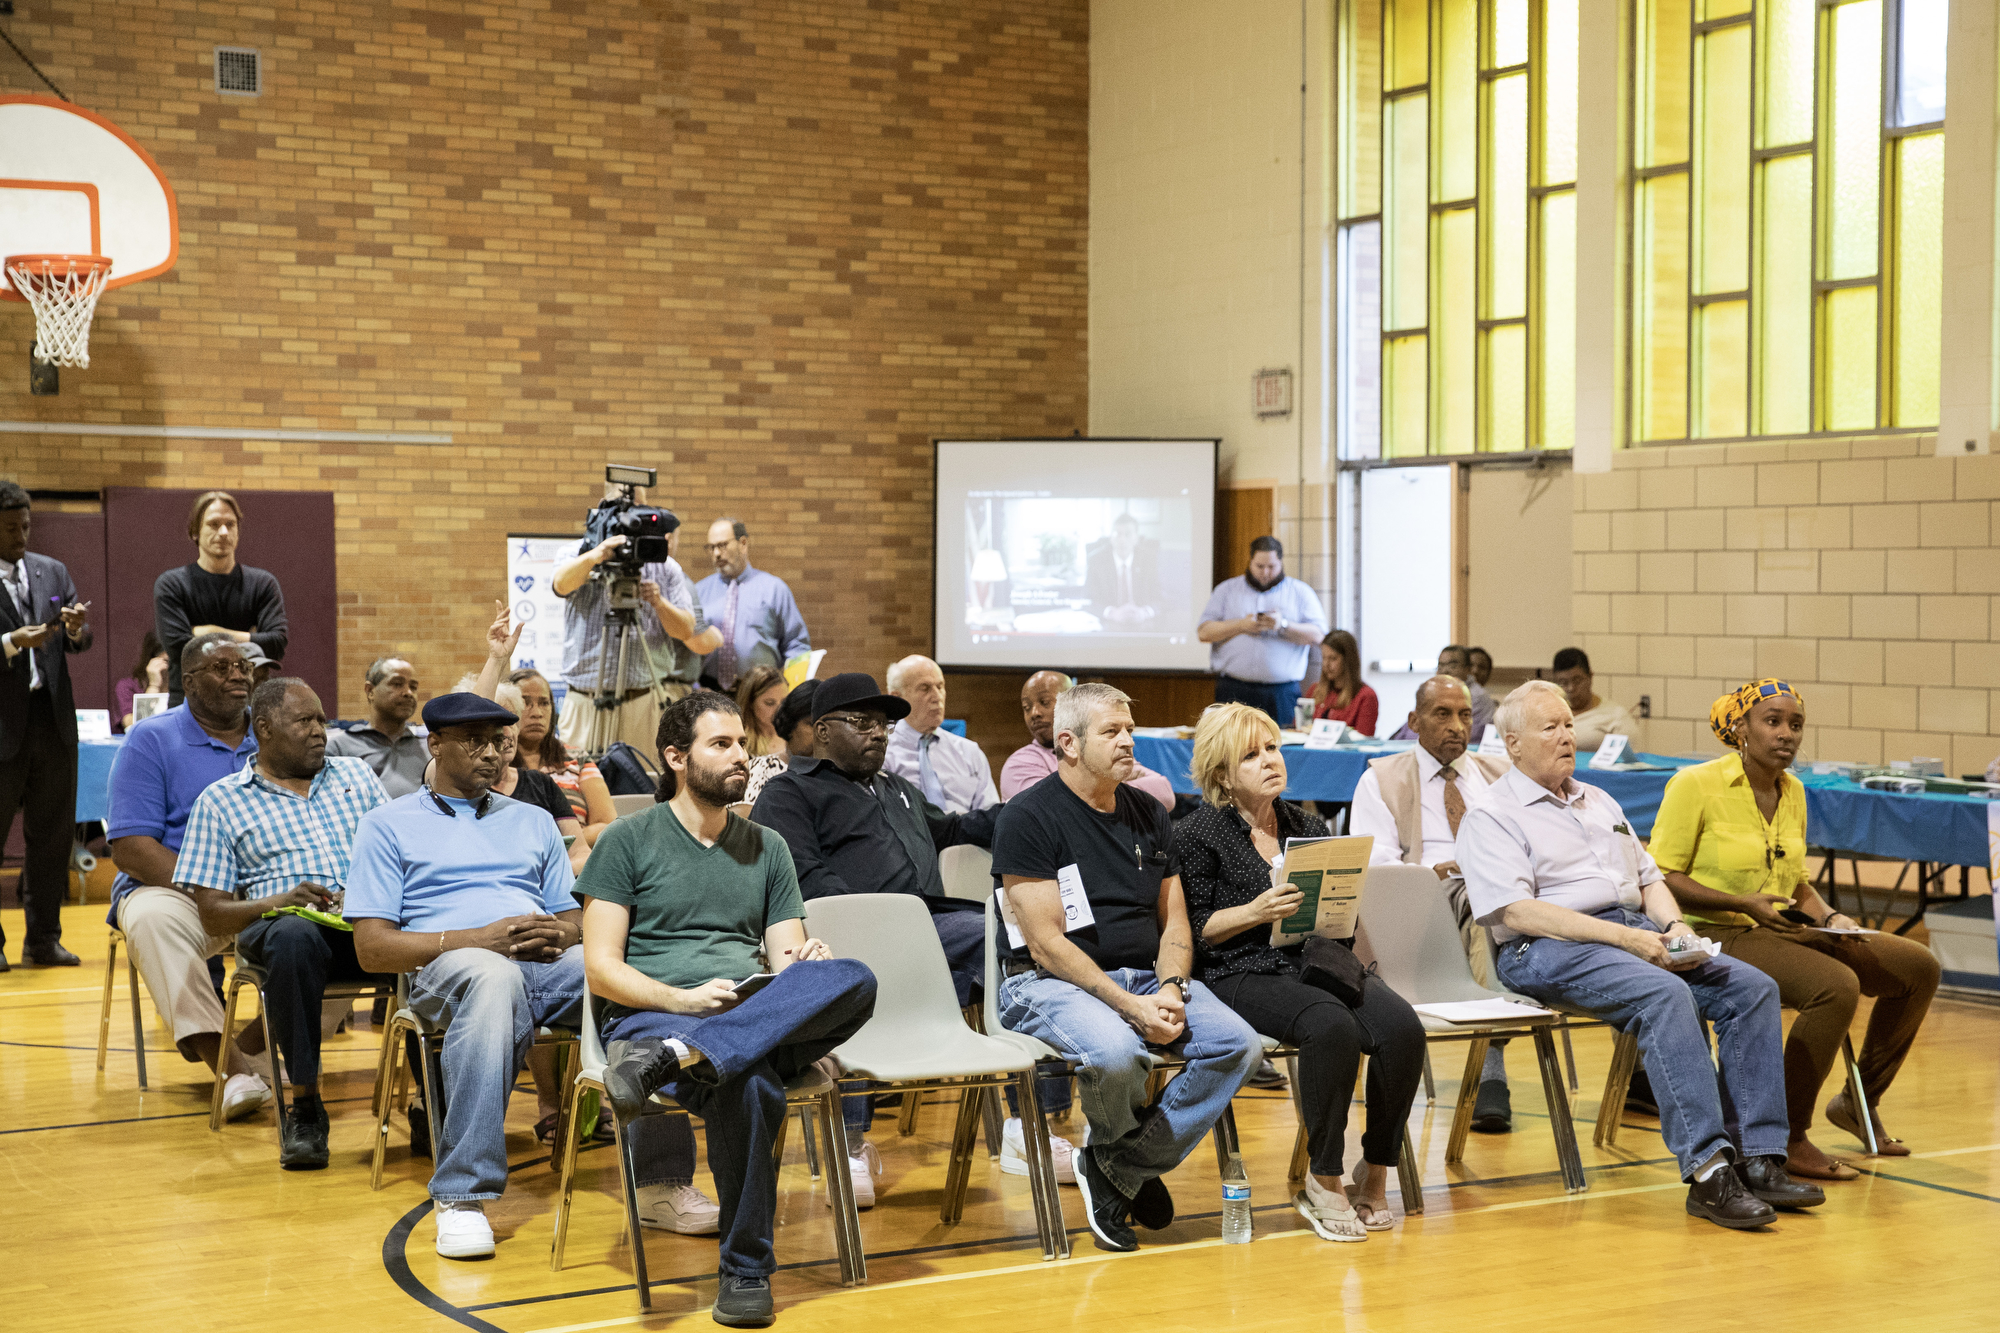 September 20, 2018: Senator Art Haywood Hosts an Open House on Addiction.